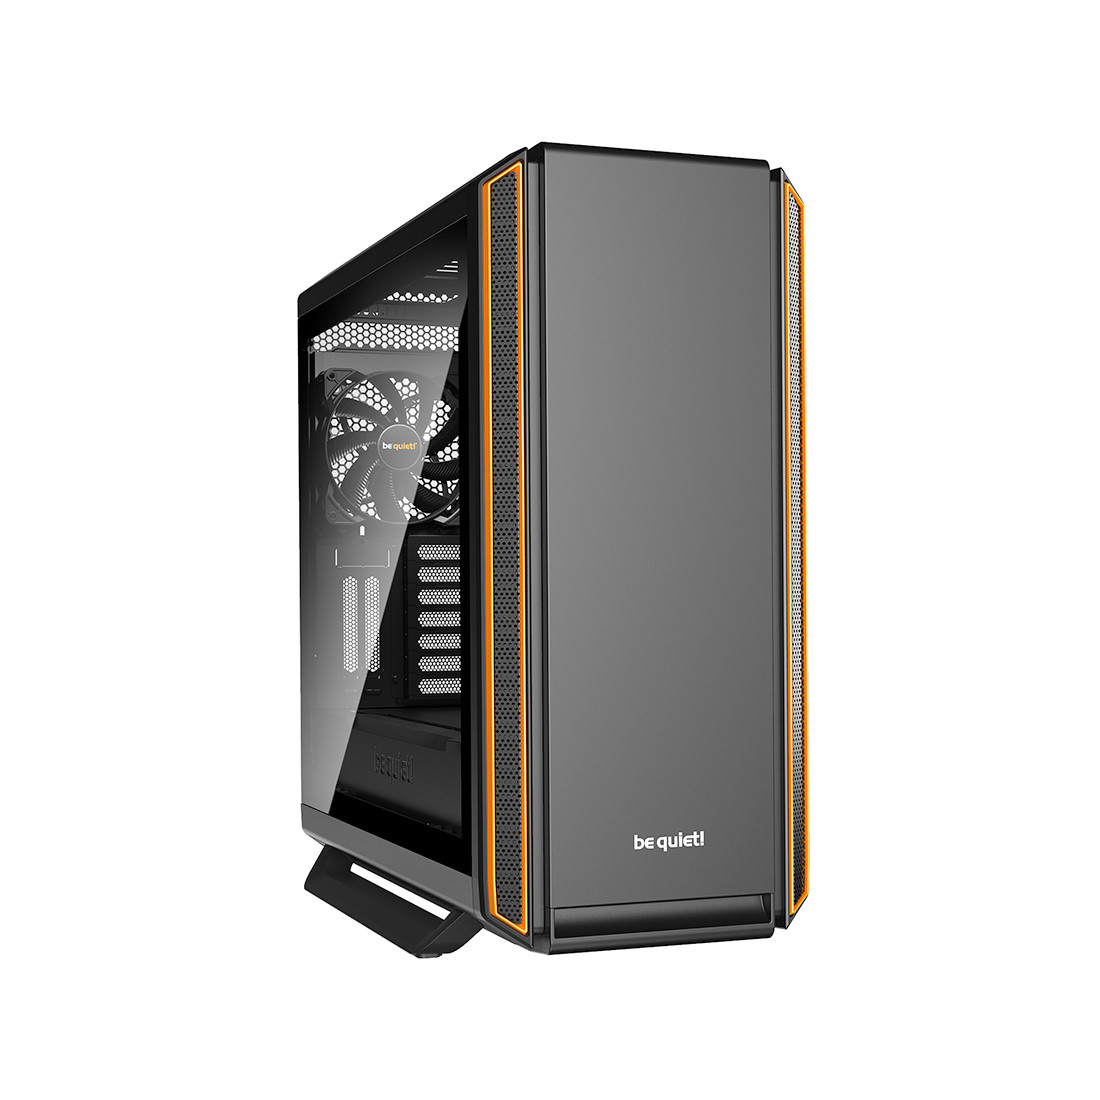 Системный блок Intel Core i7-8700 3.2GHZ/H310/DDR4 4GB/HDD 1TB/450W